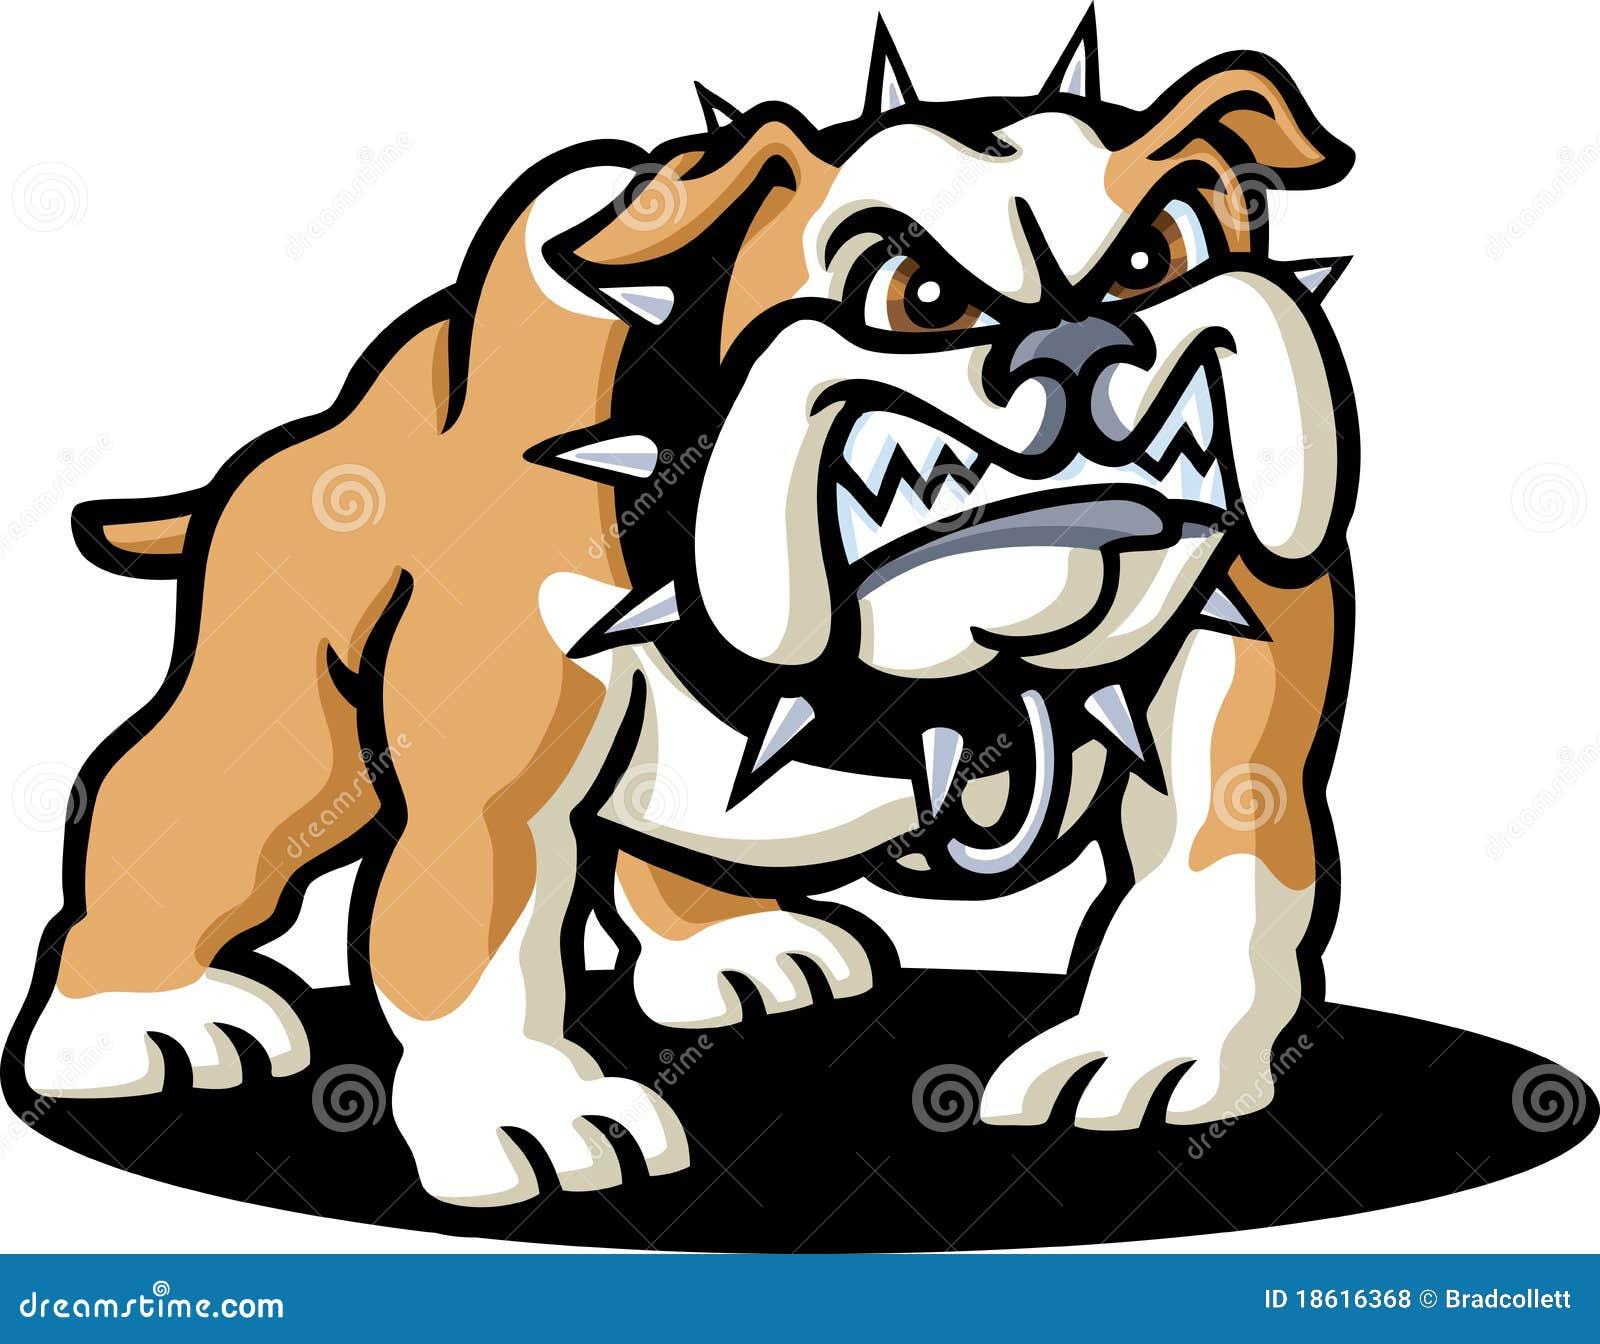 Bulldog Royalty Free Stock Photos - Image: 18616368